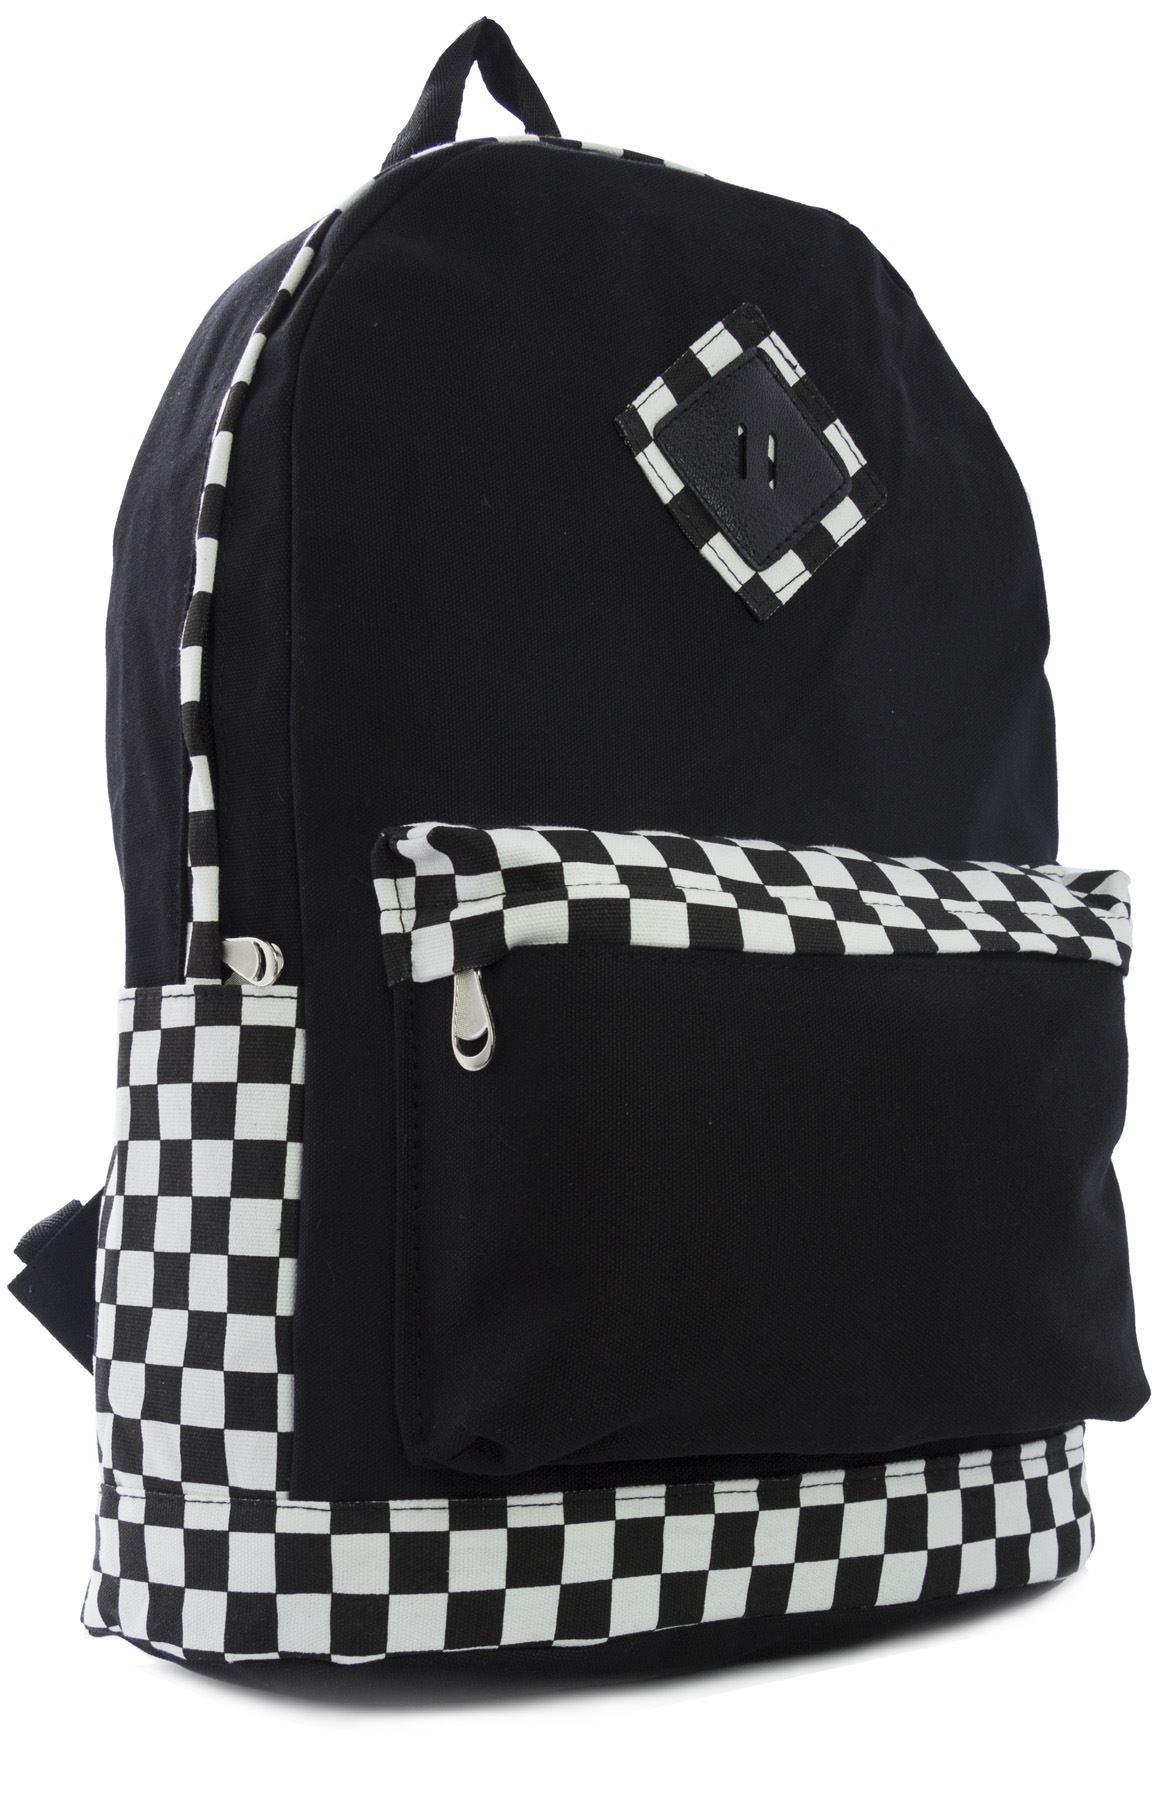 Big Handbag Shop Designer Inspired Trendy Fabric Backpack Ruksack Bag